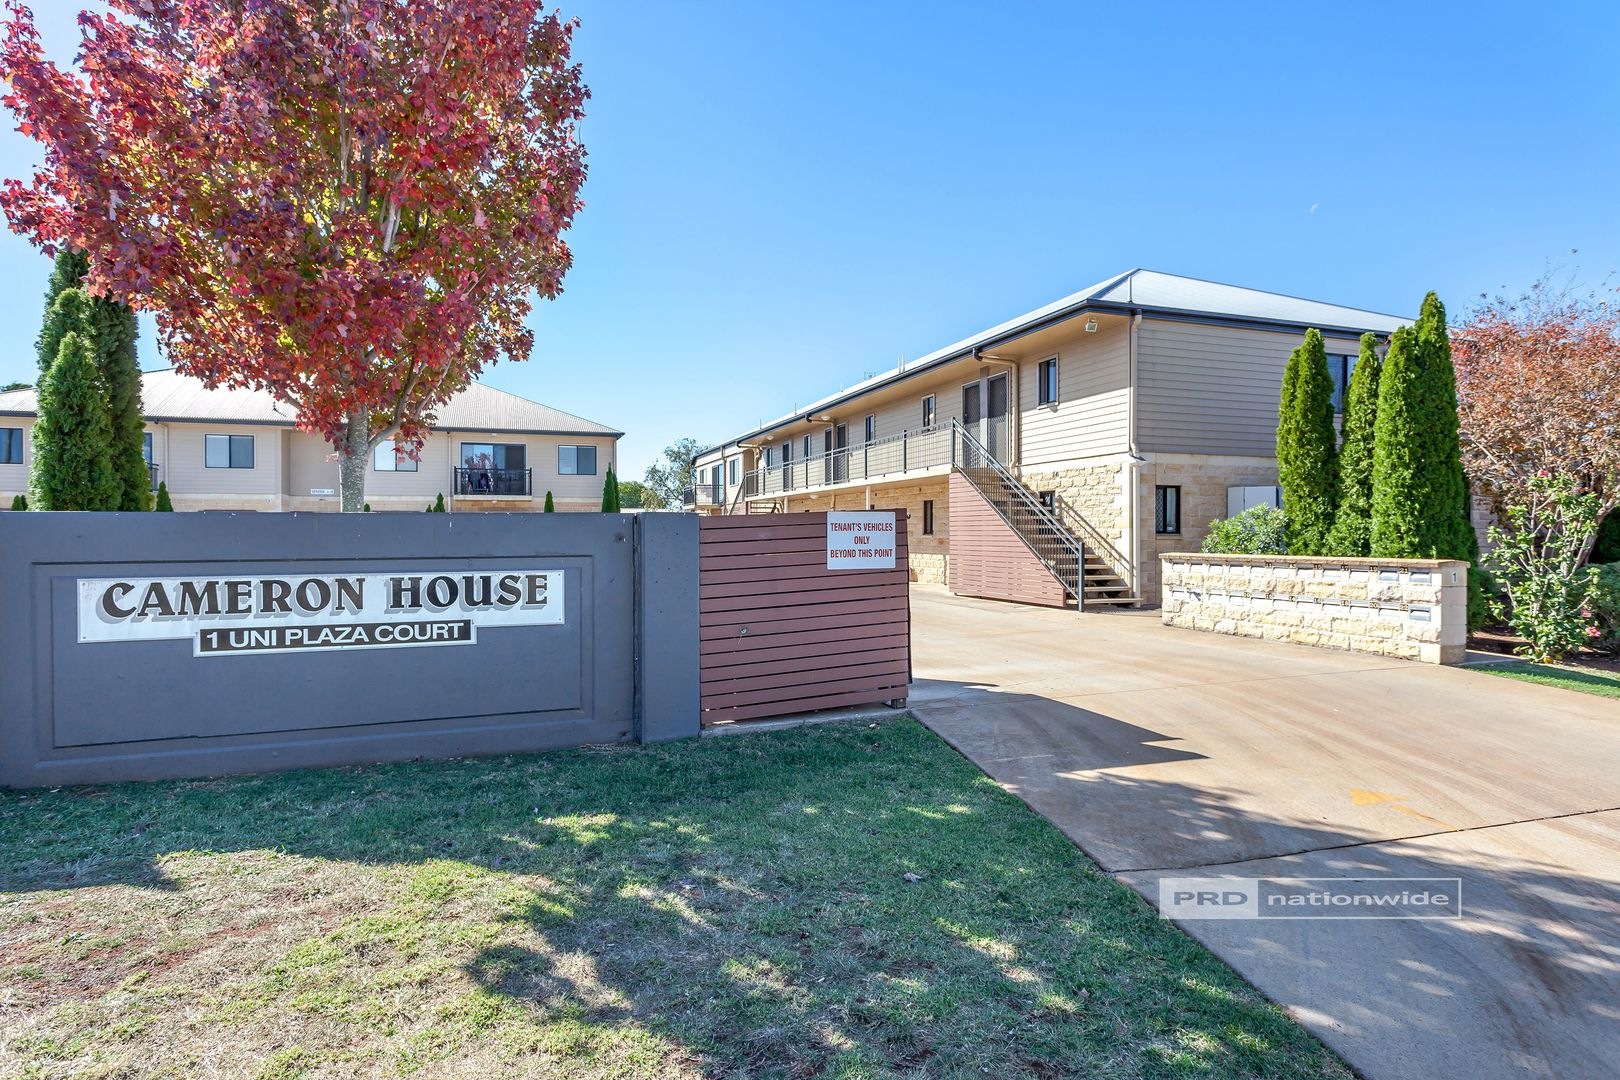 13/1-3 Uniplaza Court, Kearneys Spring QLD 4350, Image 0